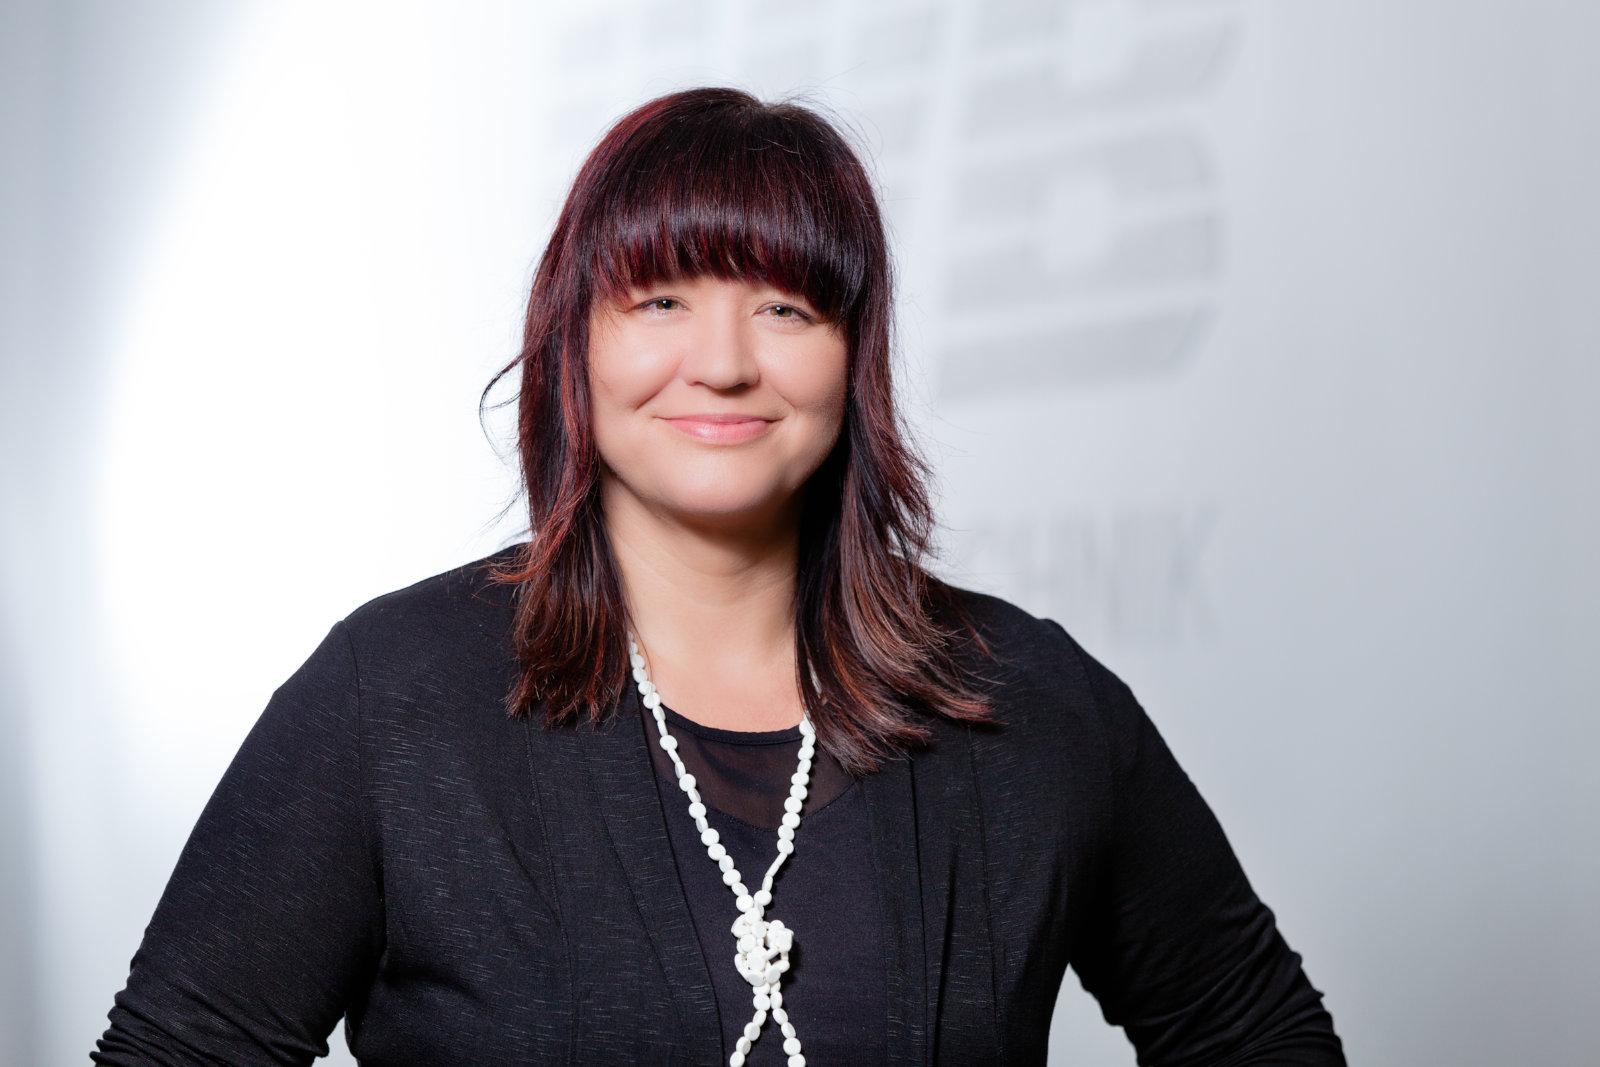 Daniela Szillat: Prokuristin, Kaufm. Leitung